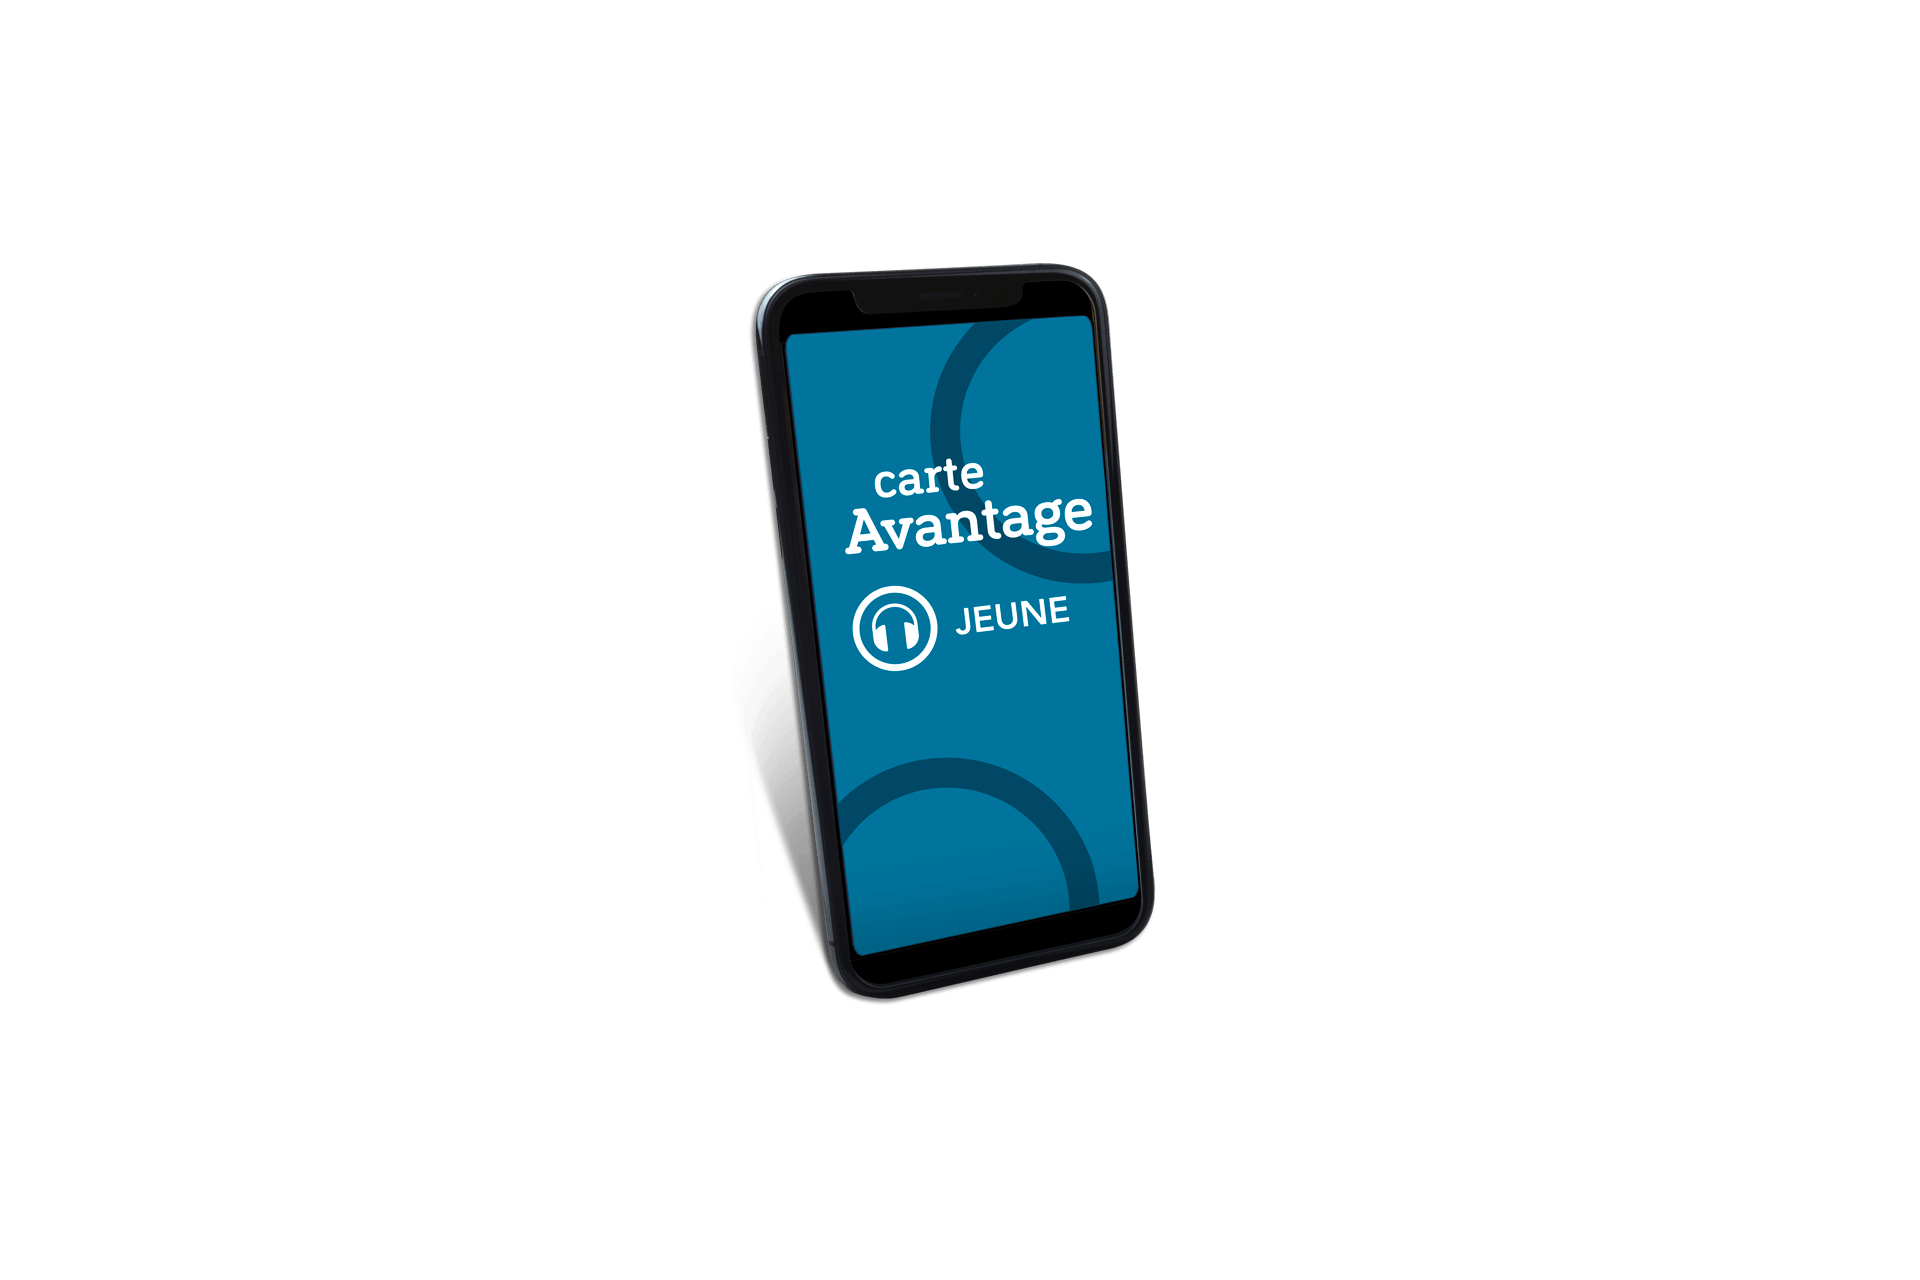 carte jeune sncf en ligne Save on travel with the Avantage Jeune card | SNCF